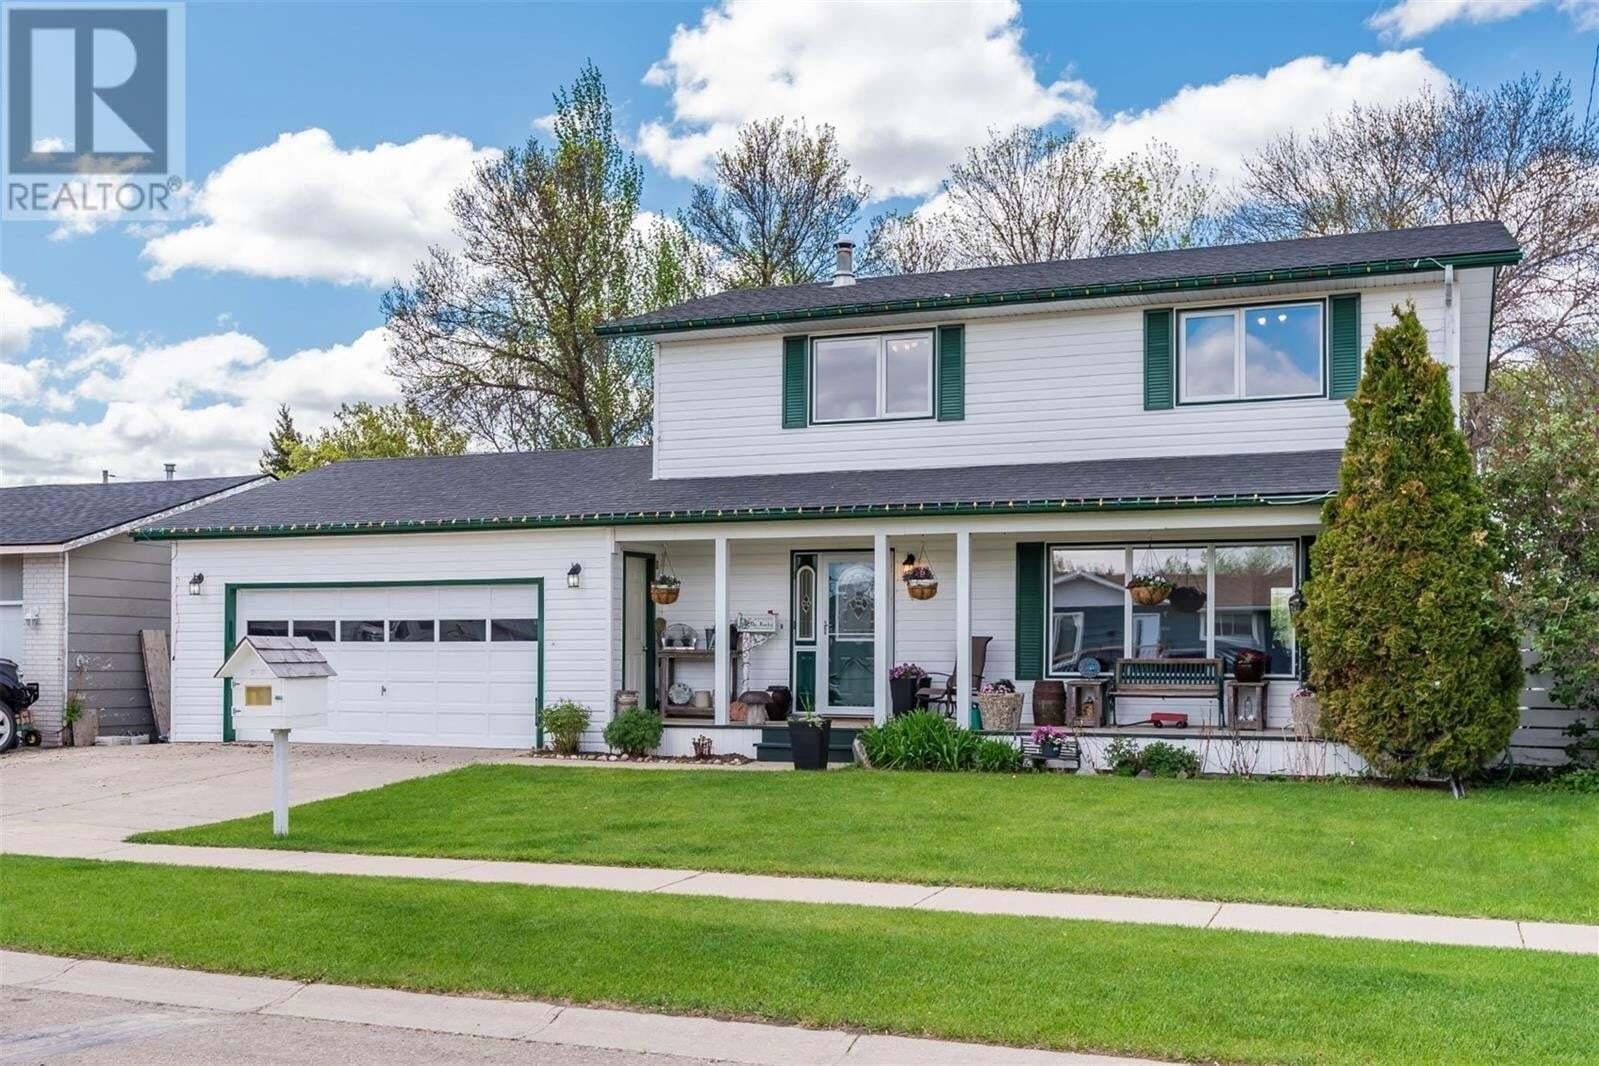 House for sale at 405 7th Ave N Warman Saskatchewan - MLS: SK810030